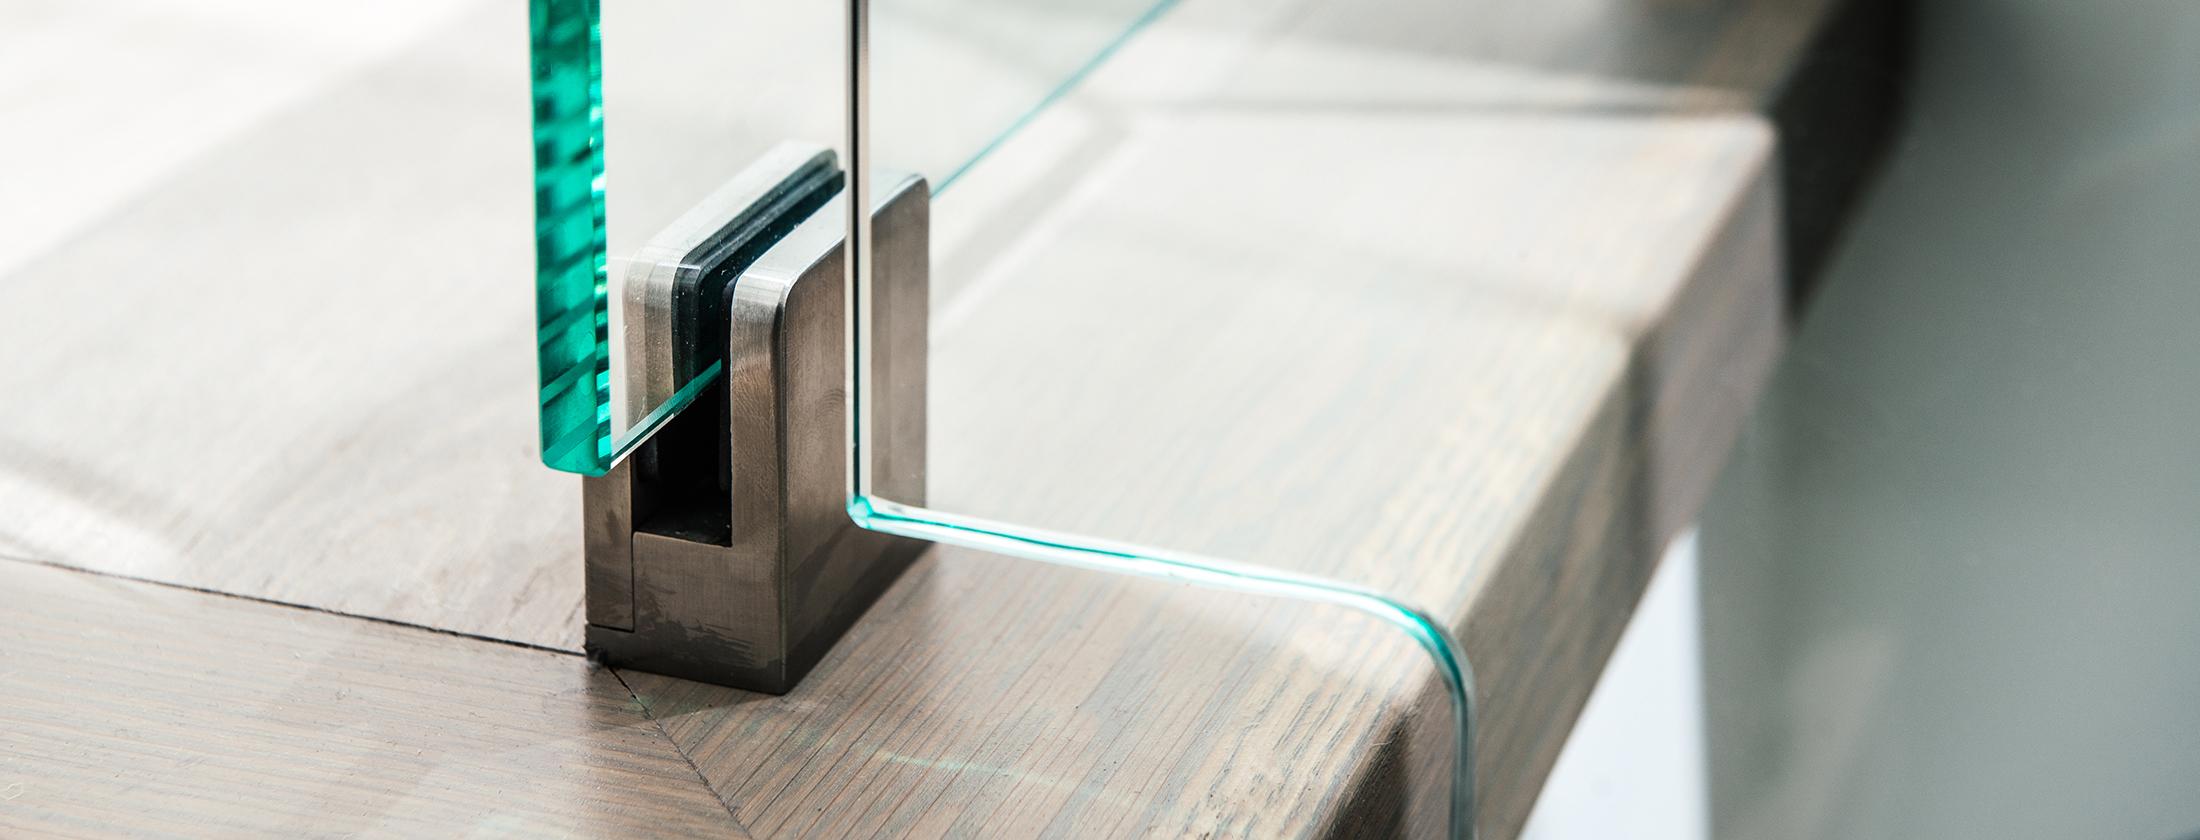 Optimum-Studios-Architectural-Glass-Metal-HardwarePage-MainImage2-042216